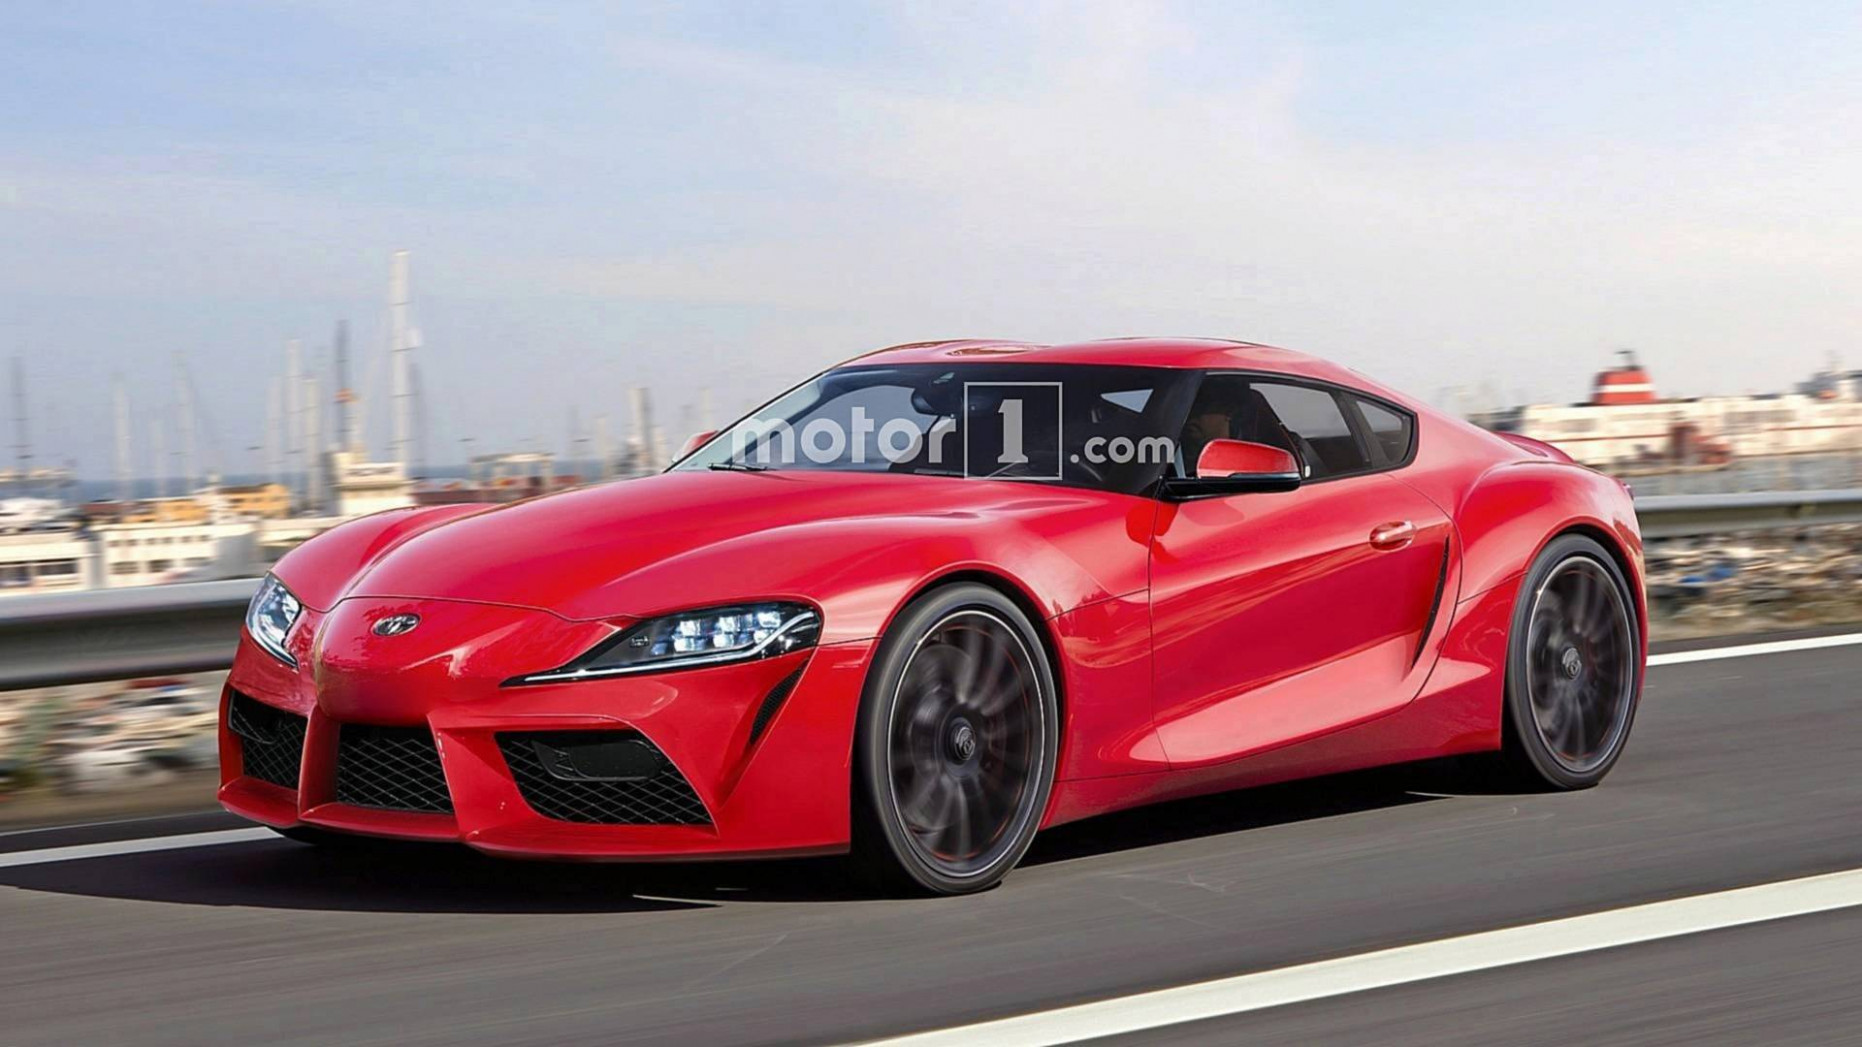 Release Toyota Gr Supra 2022 Price